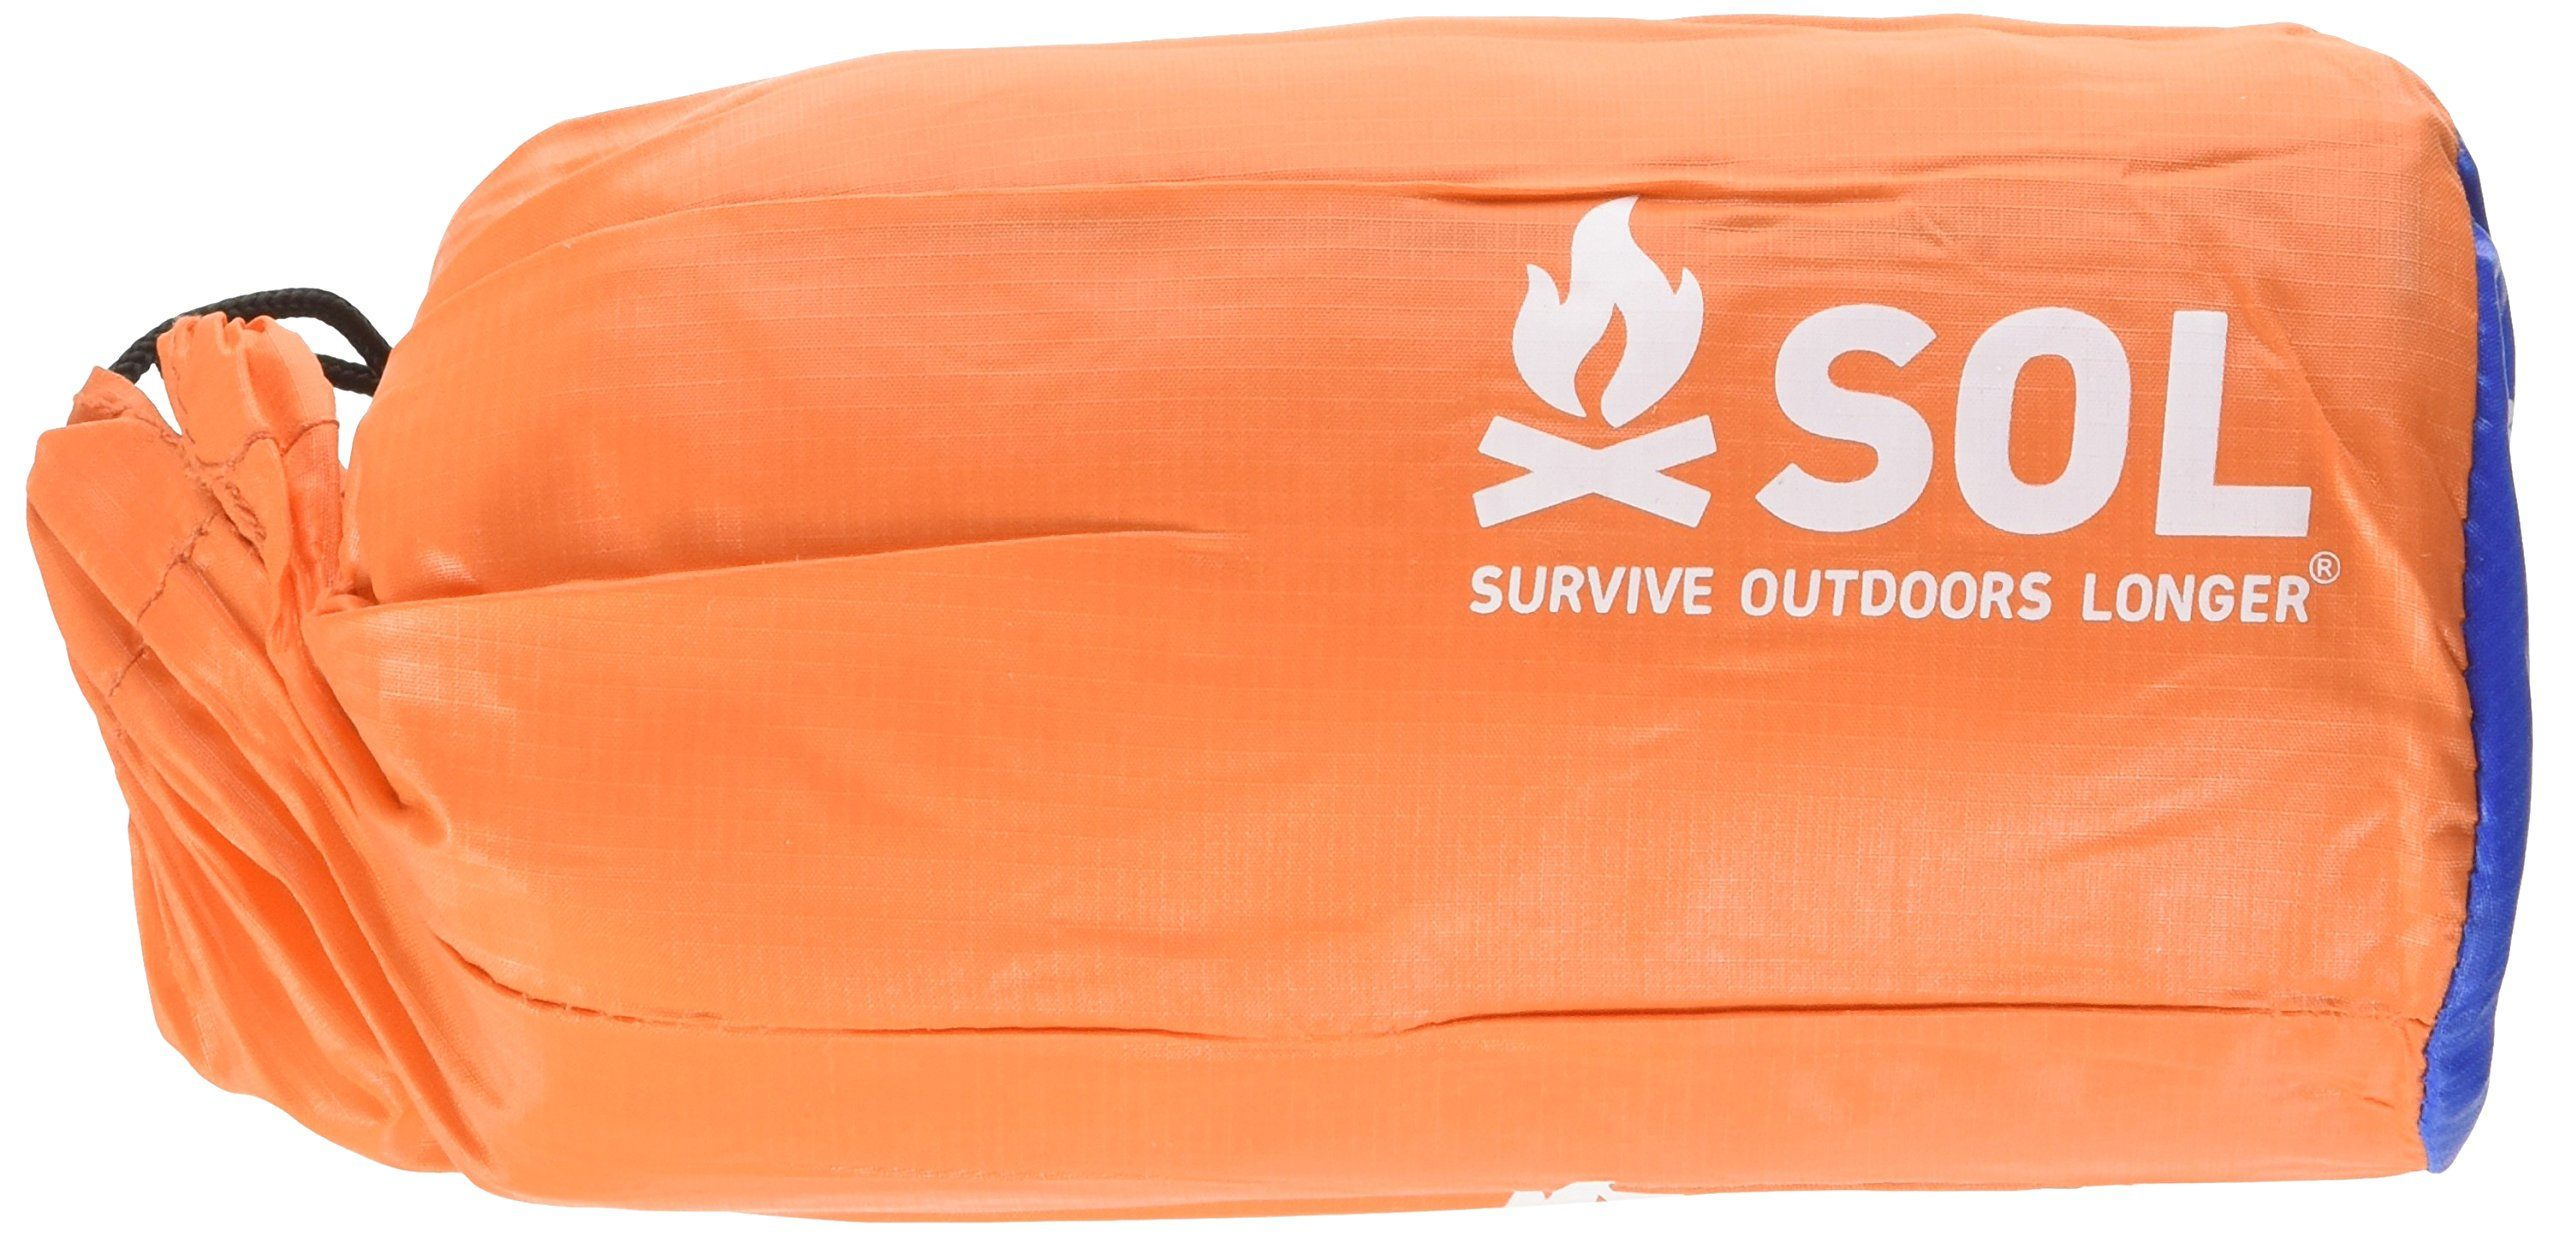 Lit sol Bebe Inspirant Amazon S O L Survive Outdoors Longer Emergency Shelter Kit